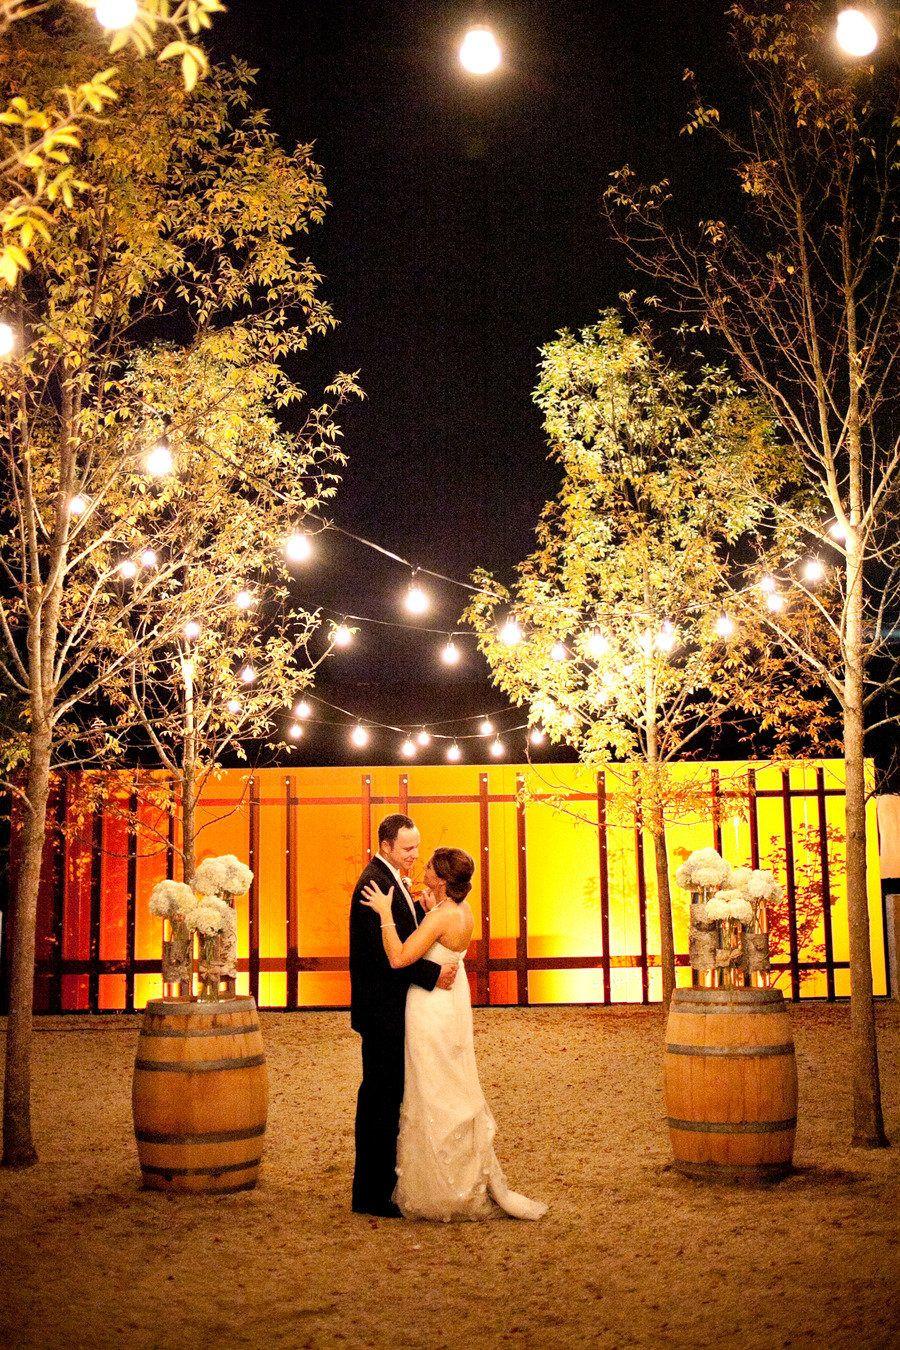 Woodinville wedding at novelty hill januik winery by angela u evan